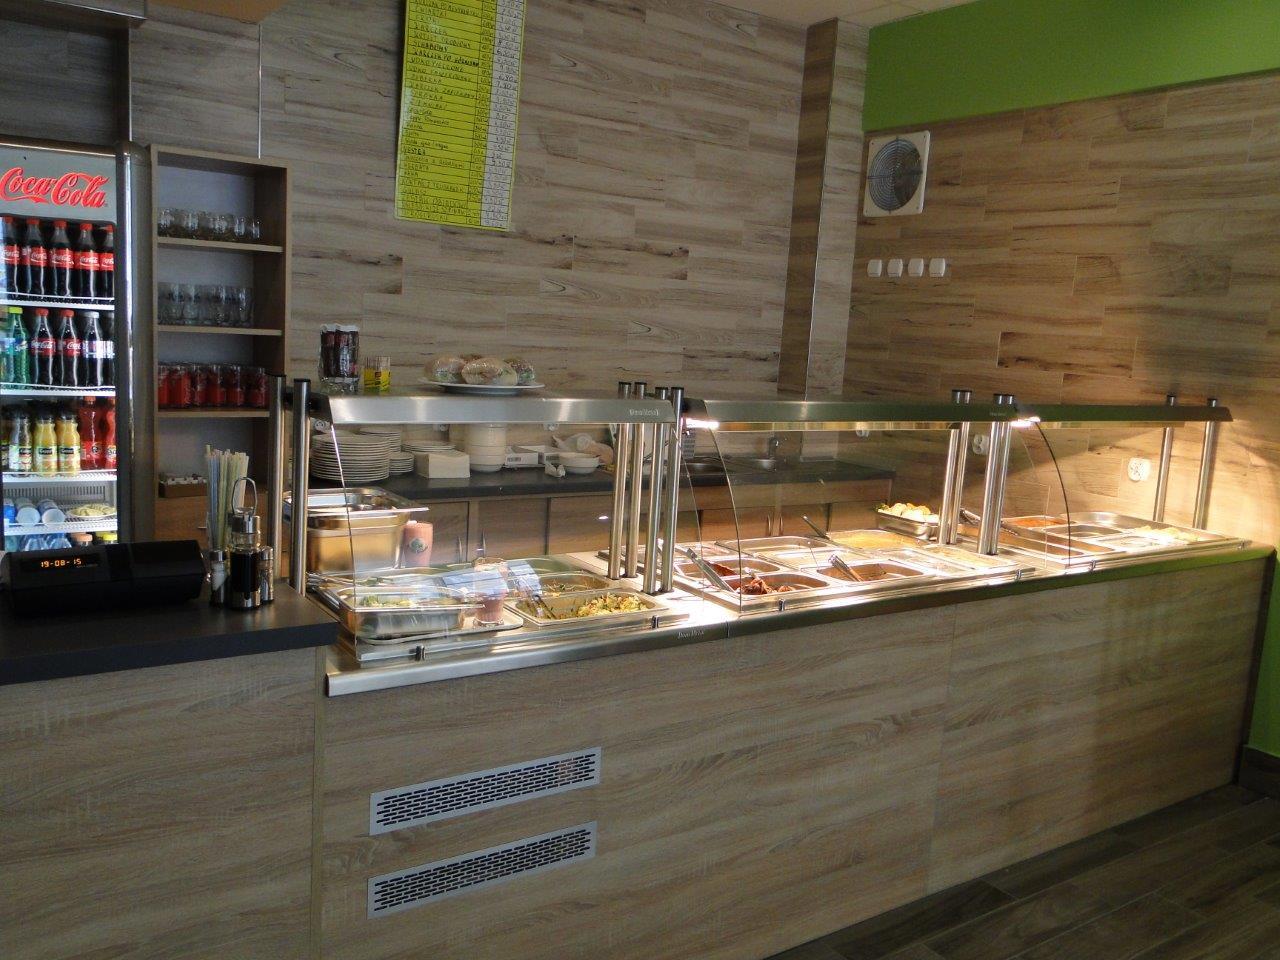 Projekt technologiczny kuchni, lokalu gastronomiczego -> Projekt Kuchni Gastronomicznej